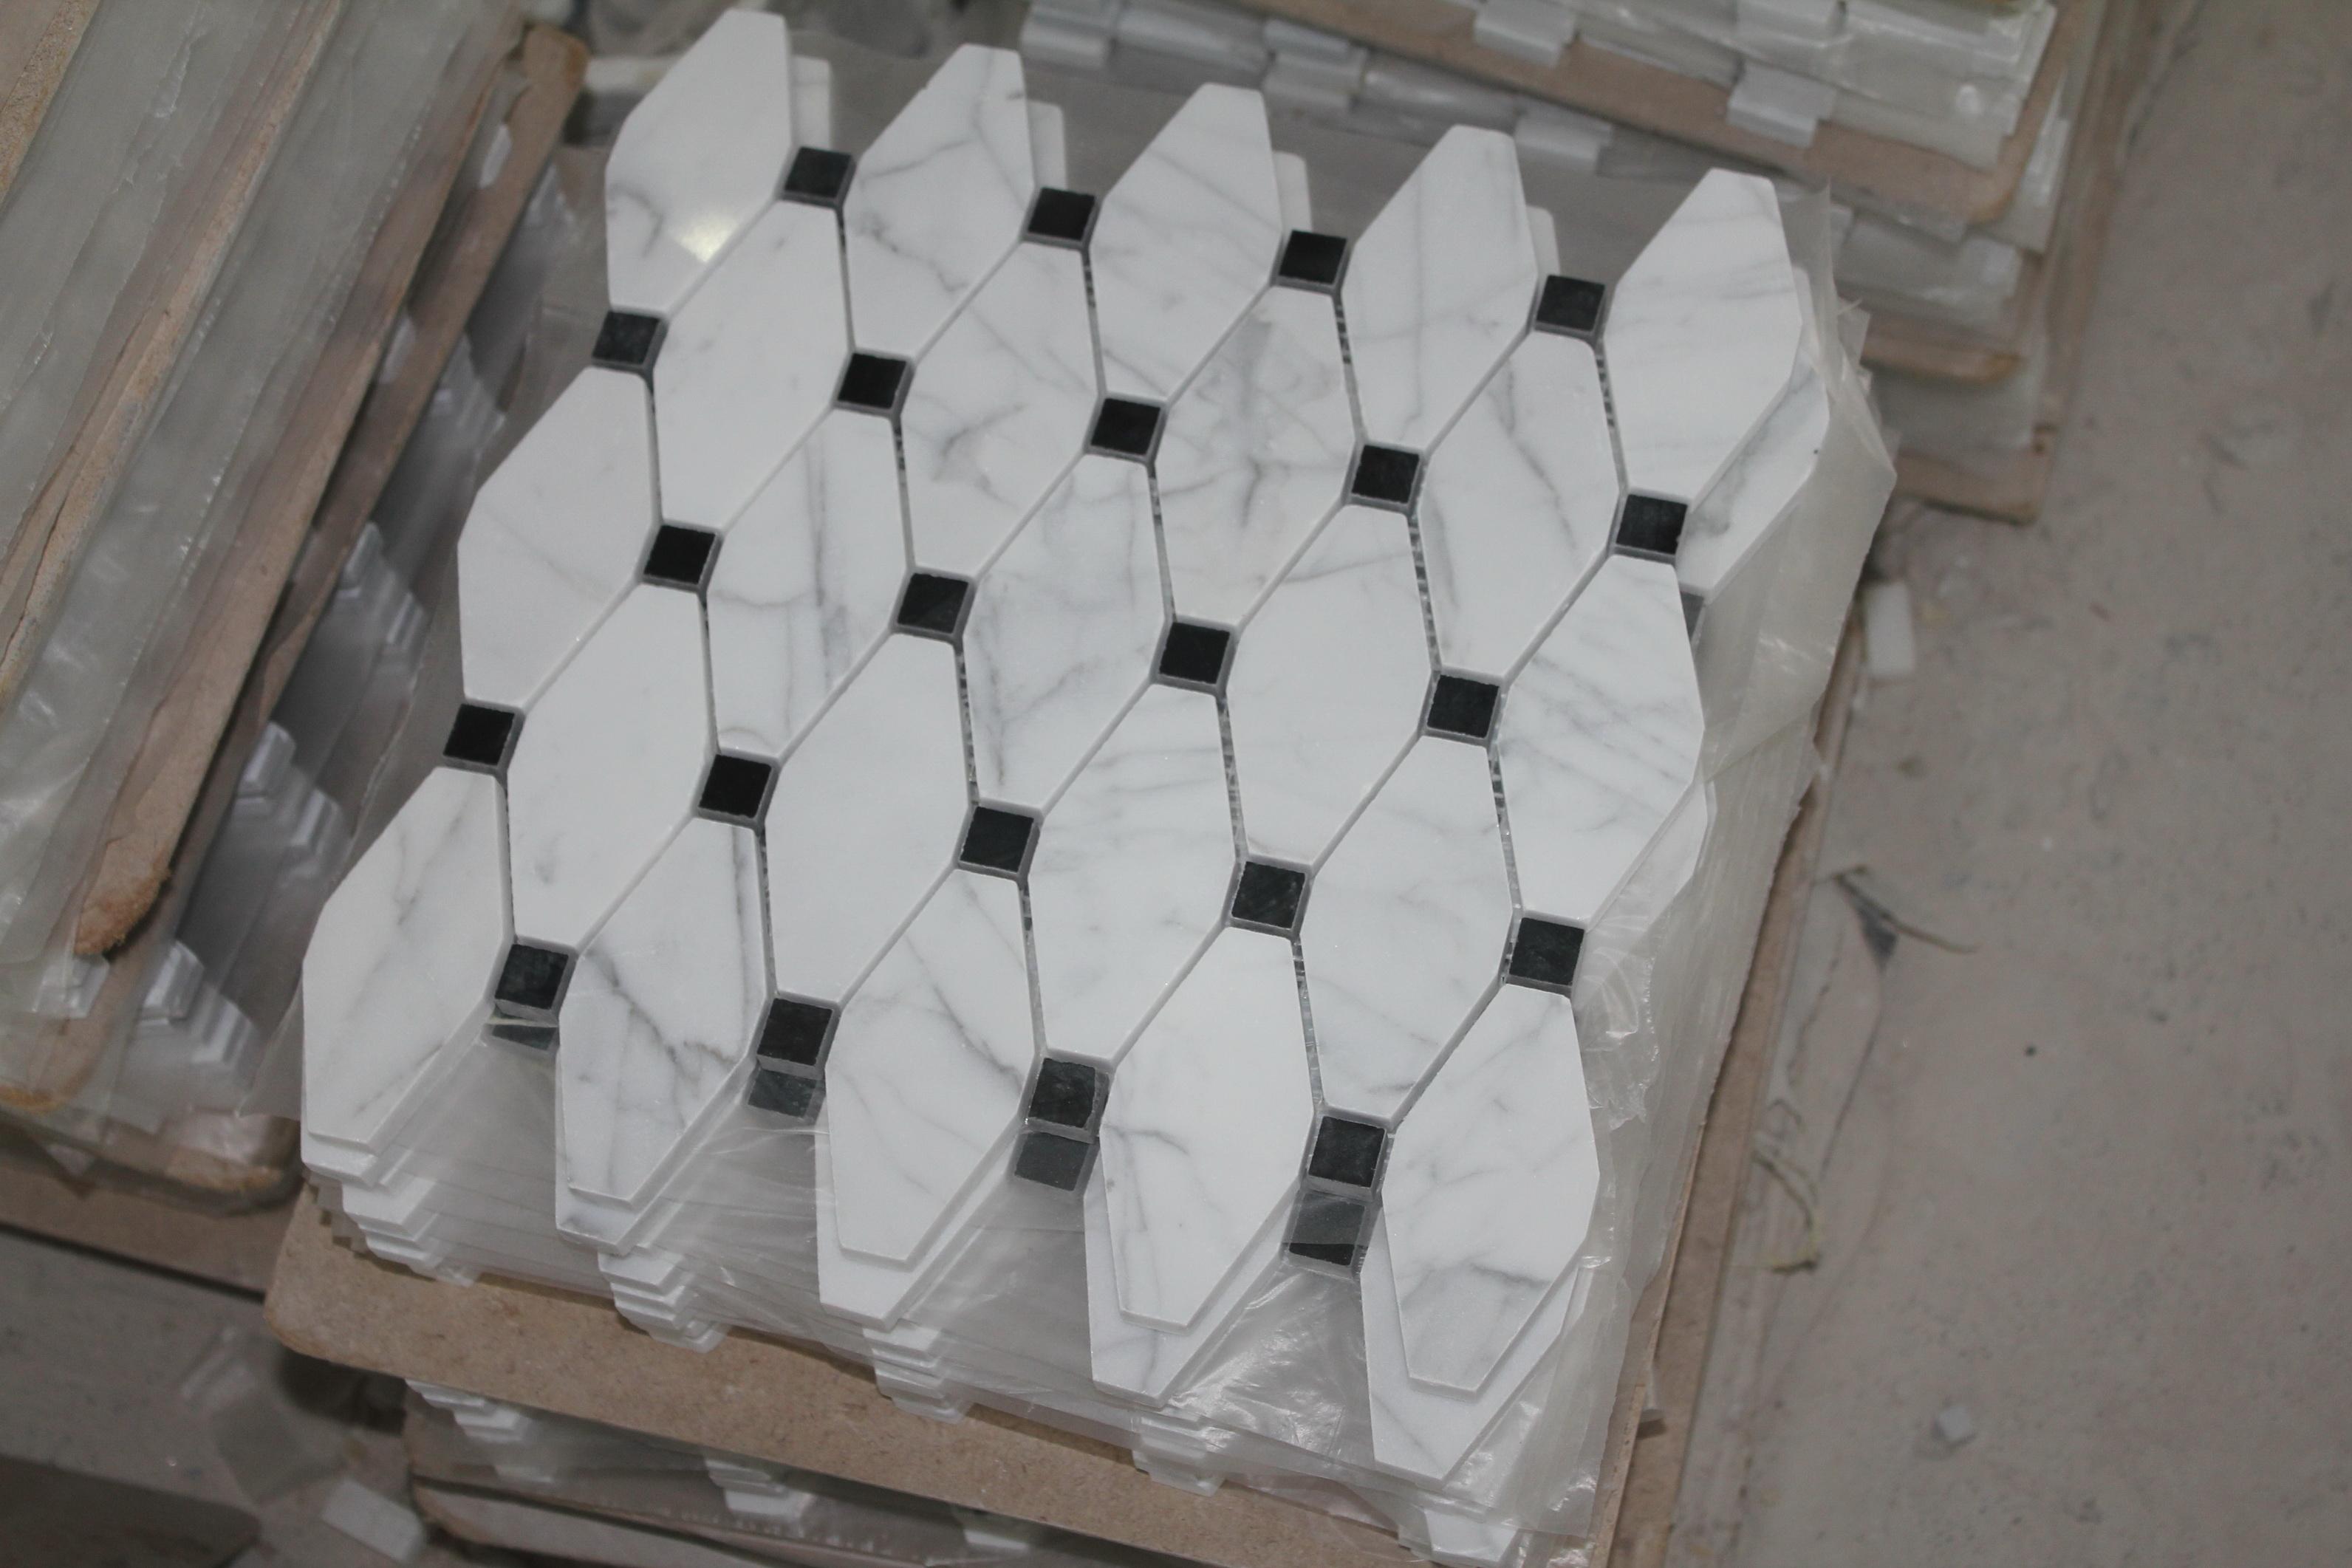 Carrara Bianco Long Octagon Mosaic The Builder Depot Blog